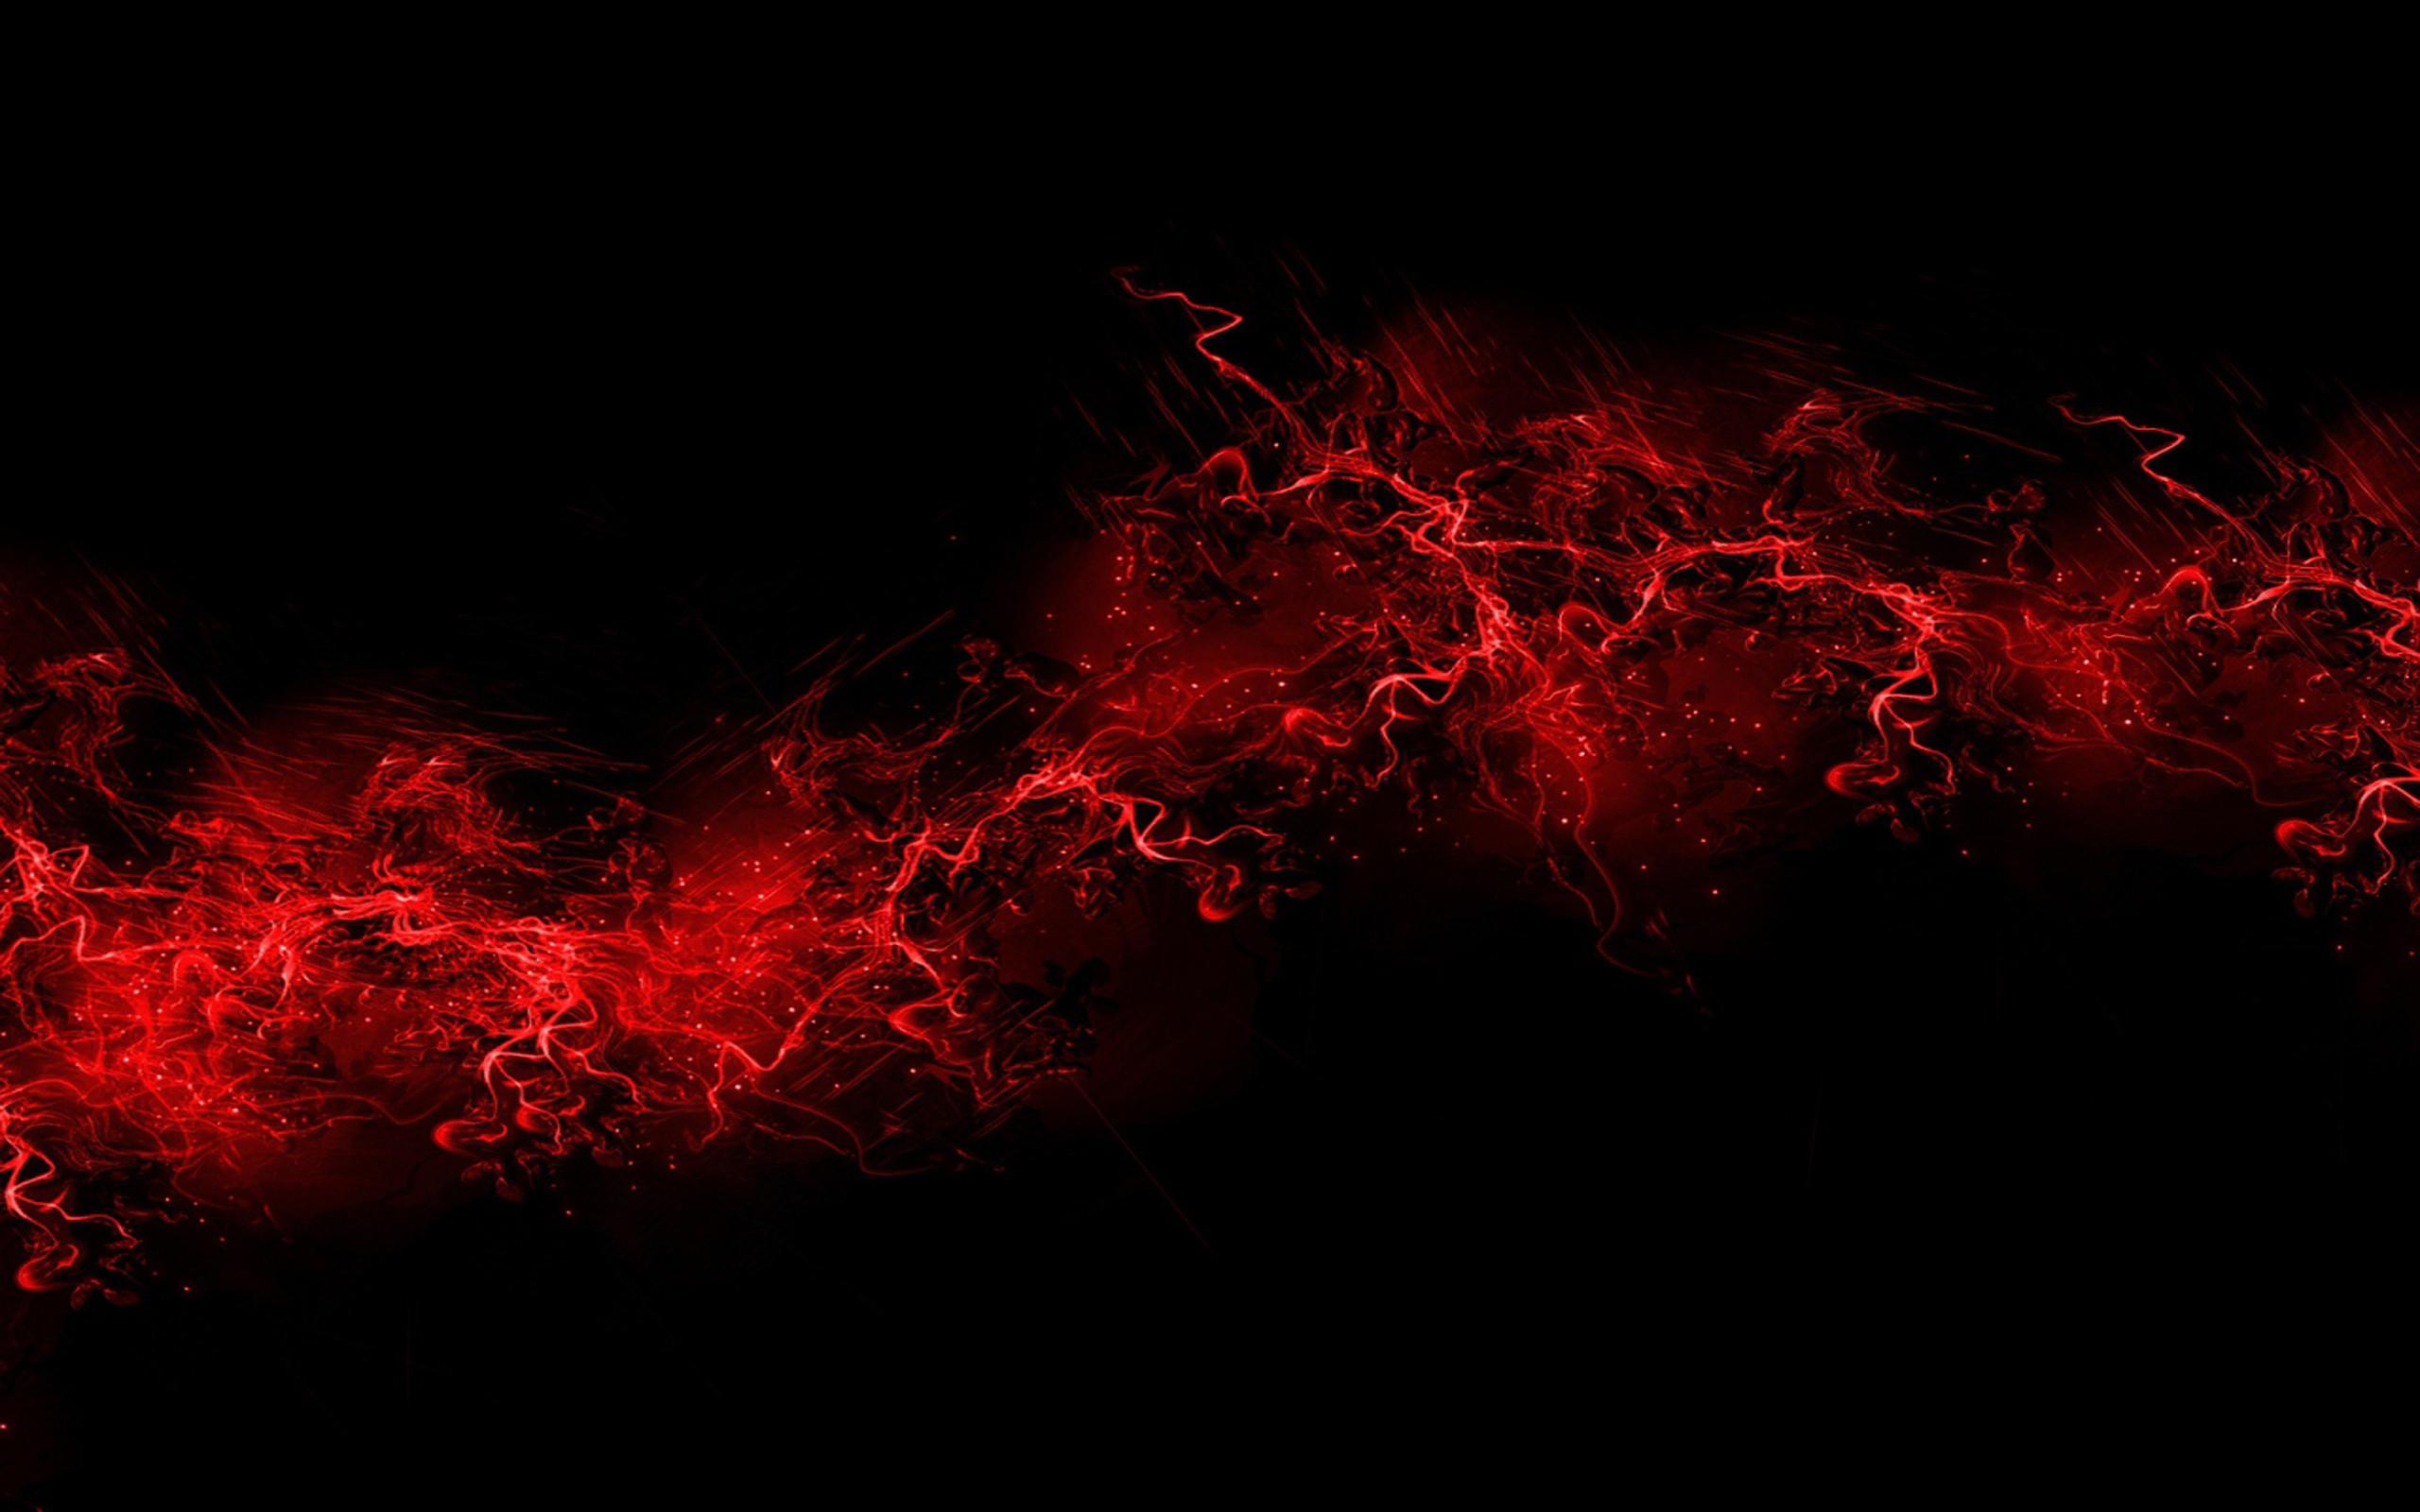 Dragon Wallpaper Iphone X Black Background Red Color Paint Explosion Burst 746